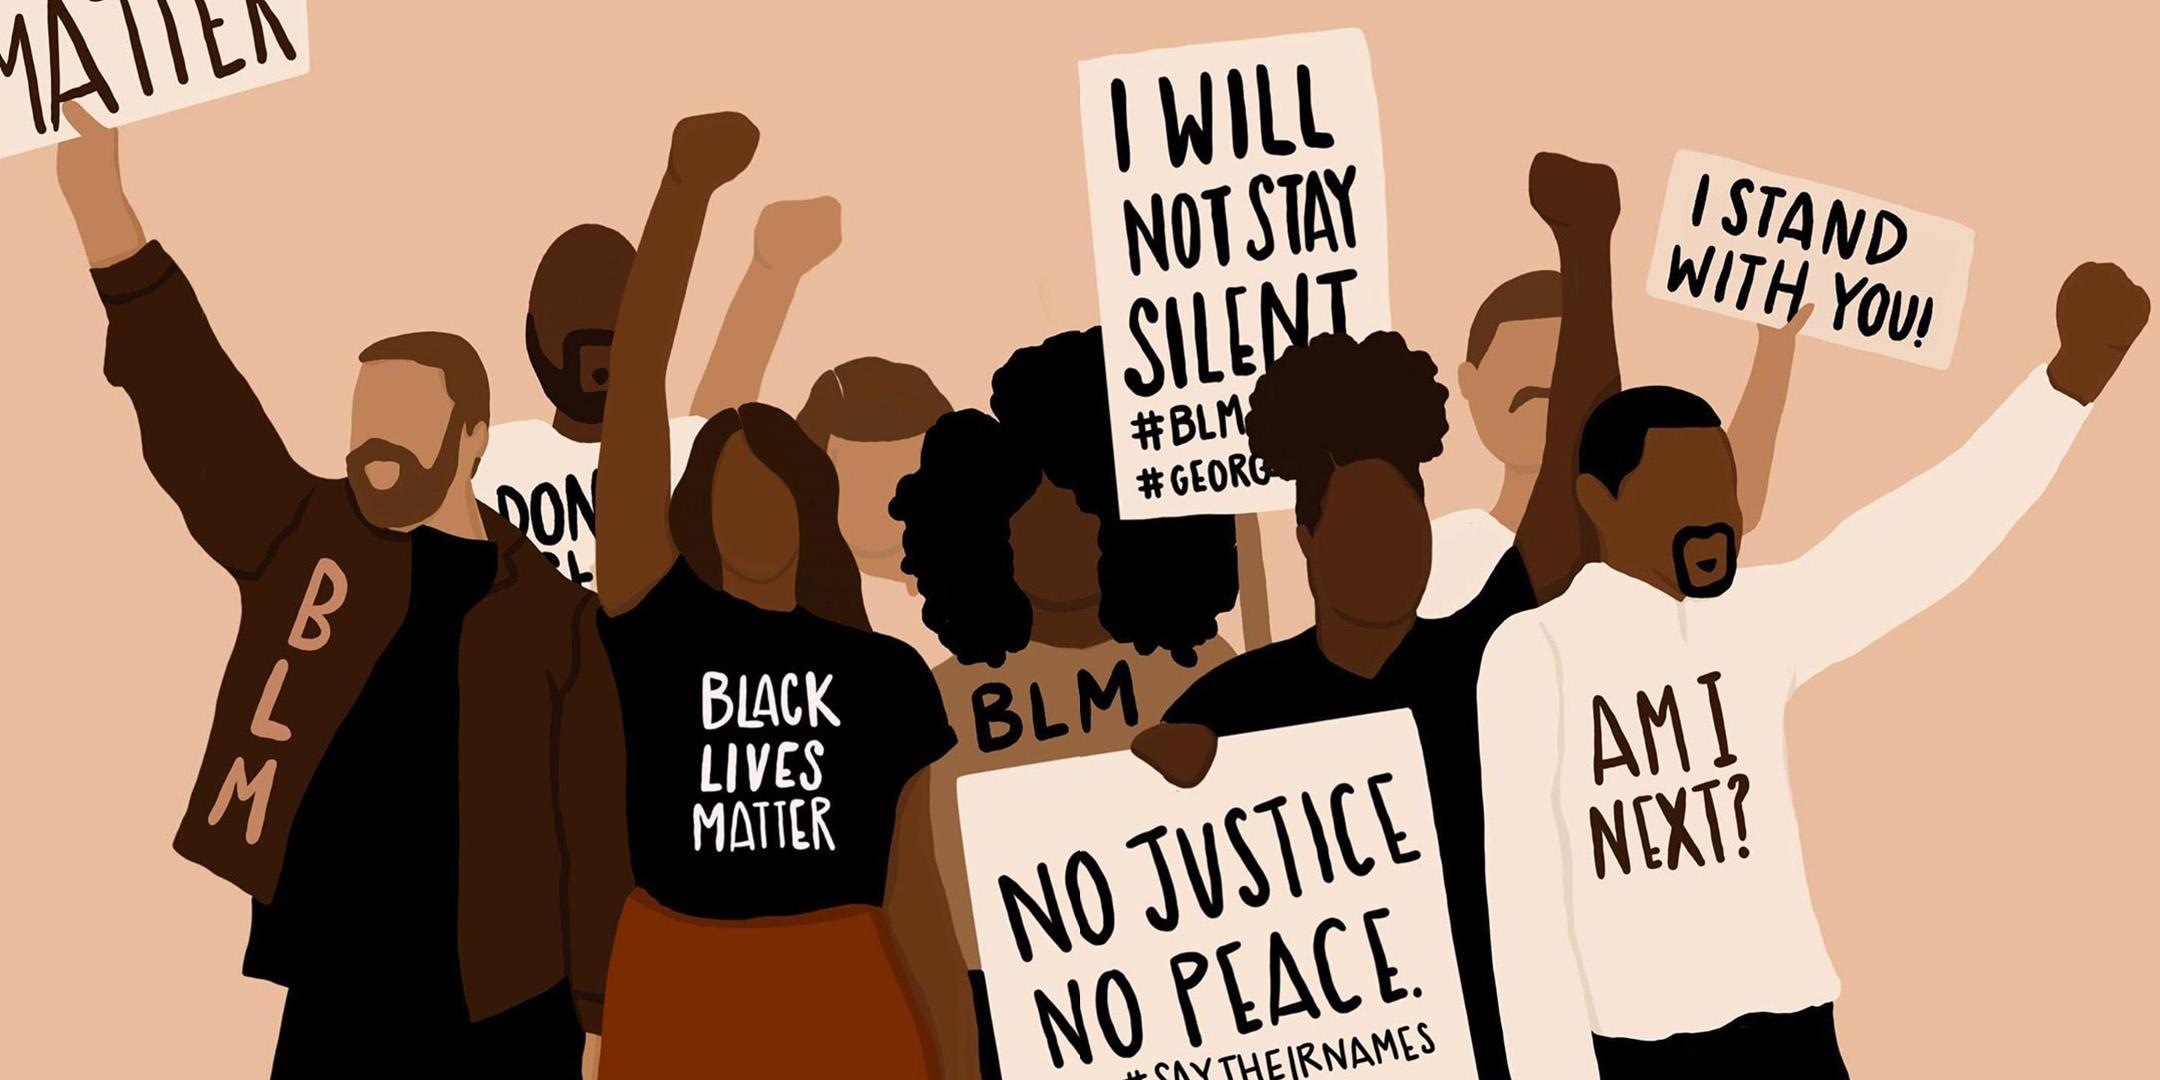 Black Lives Matter Banner Graphic via Stormy Nesbit